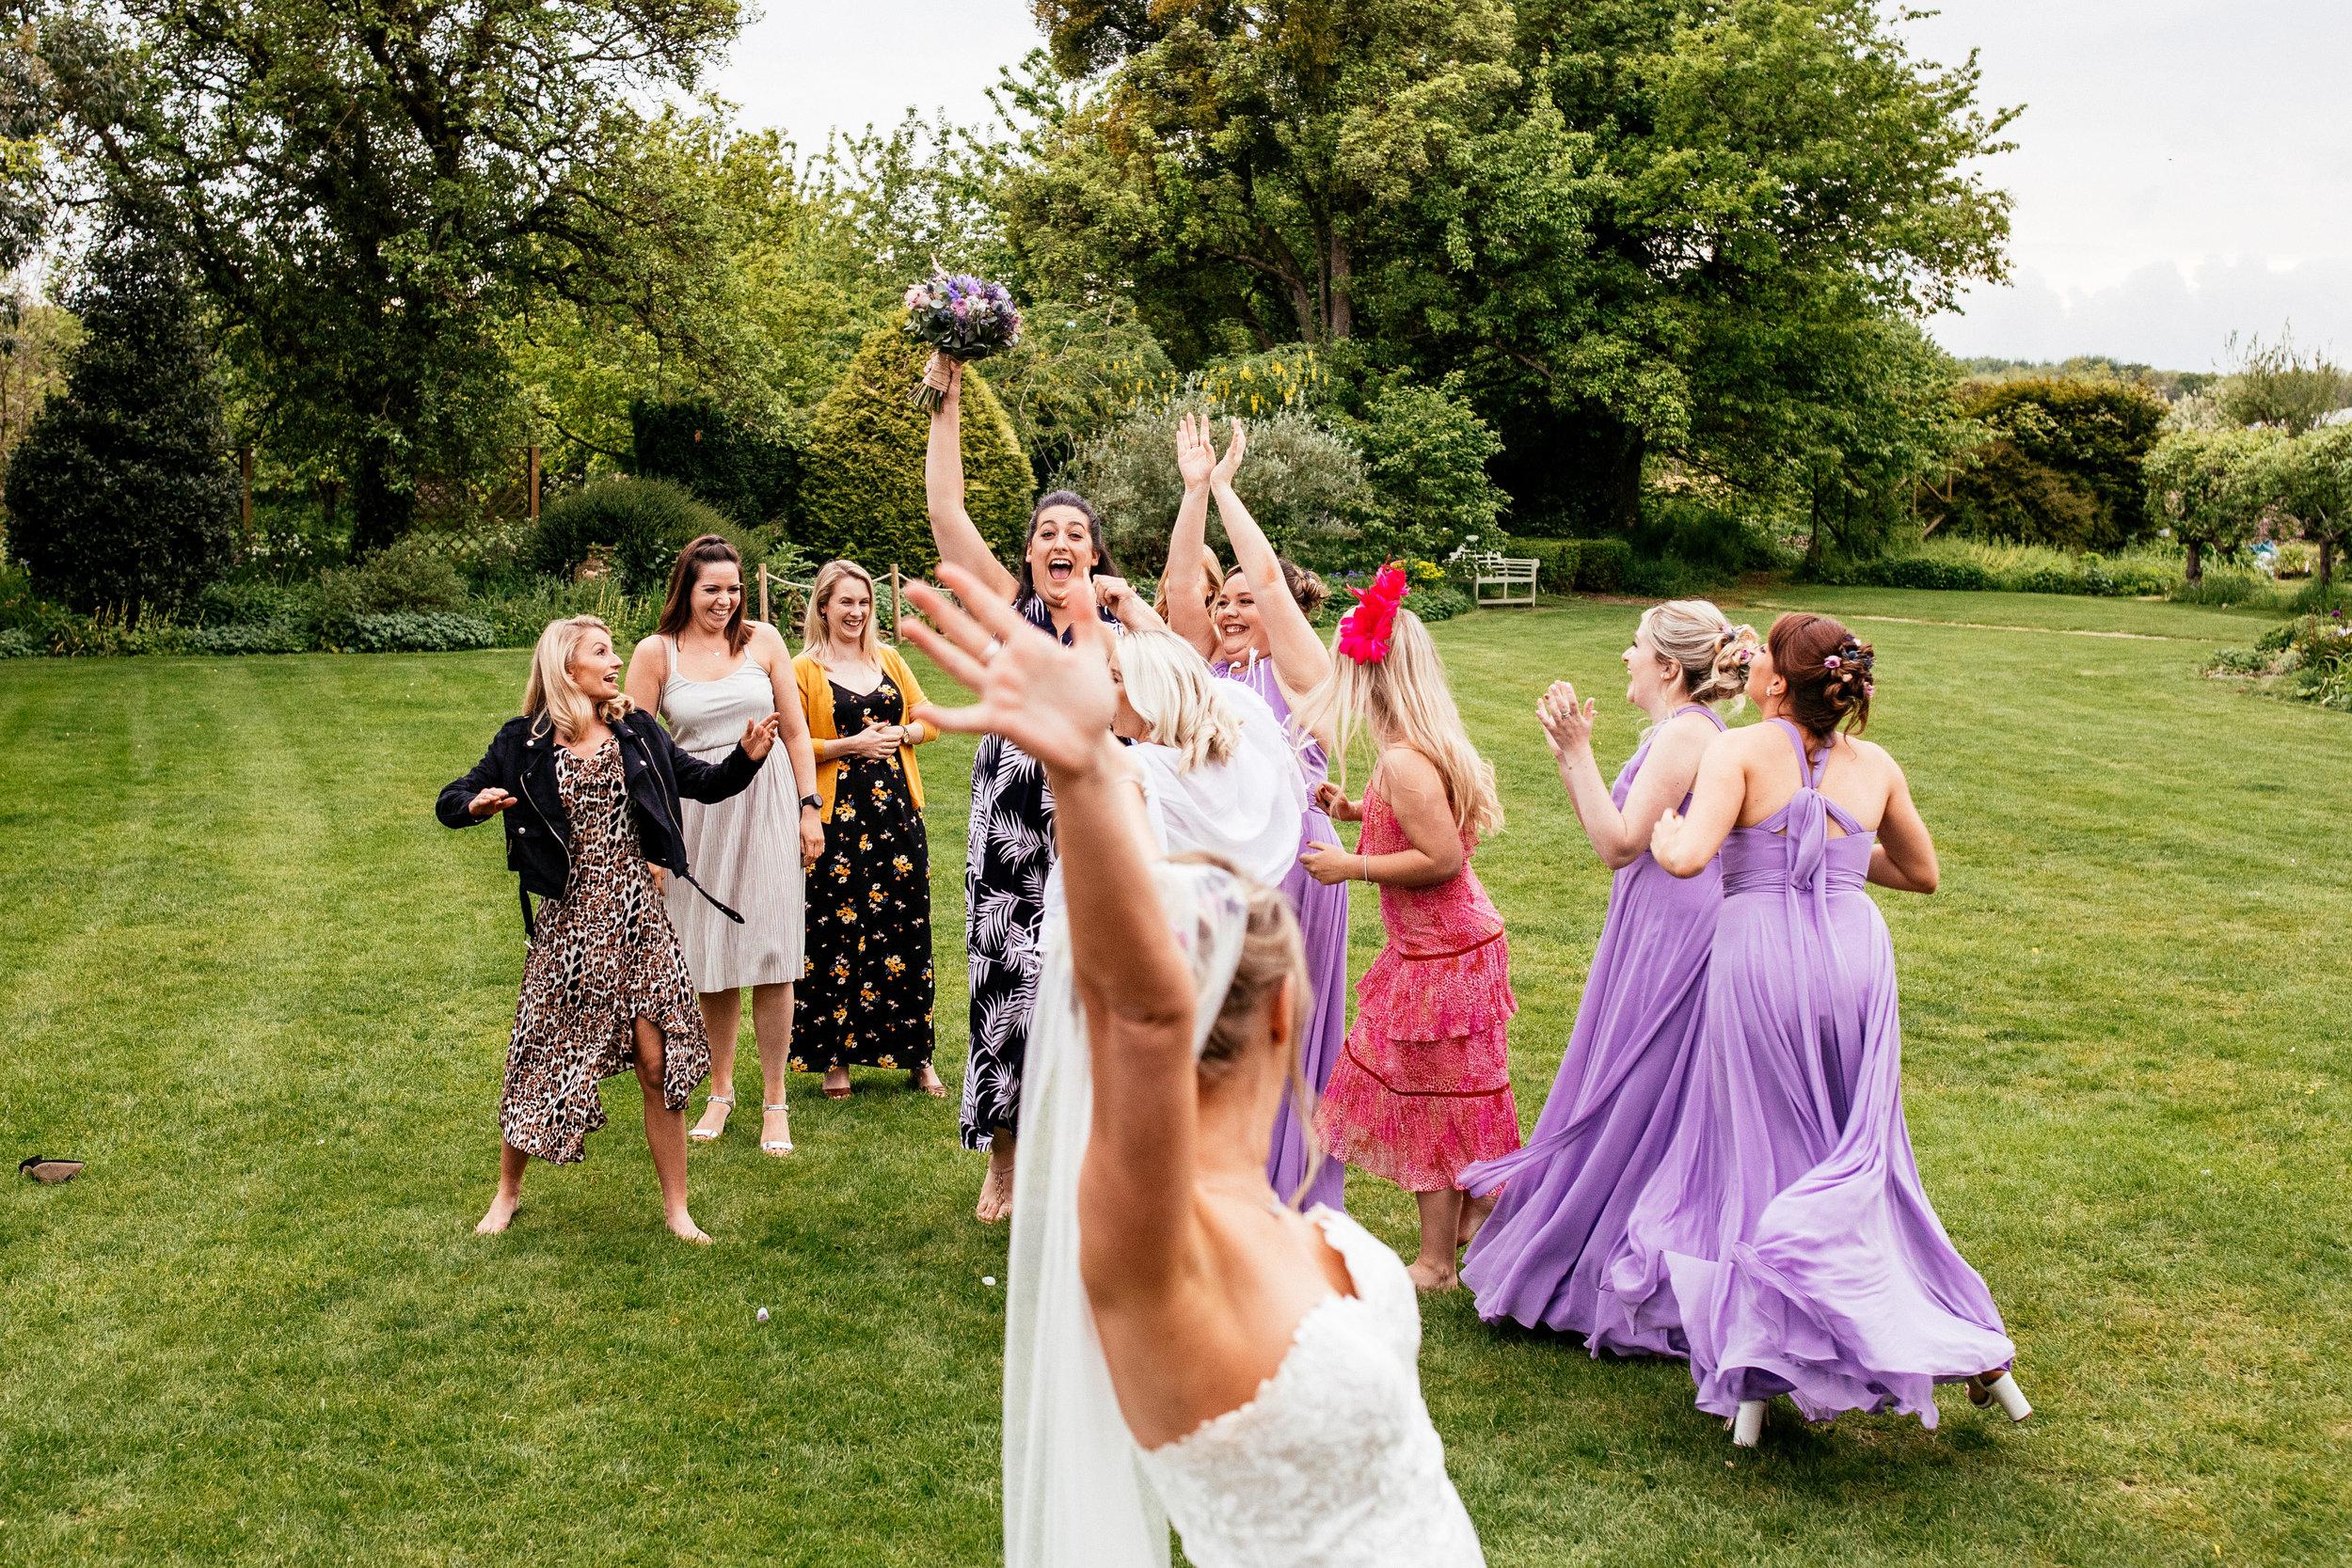 Becky-and-Sam-Wedding-Highlights-71.jpg